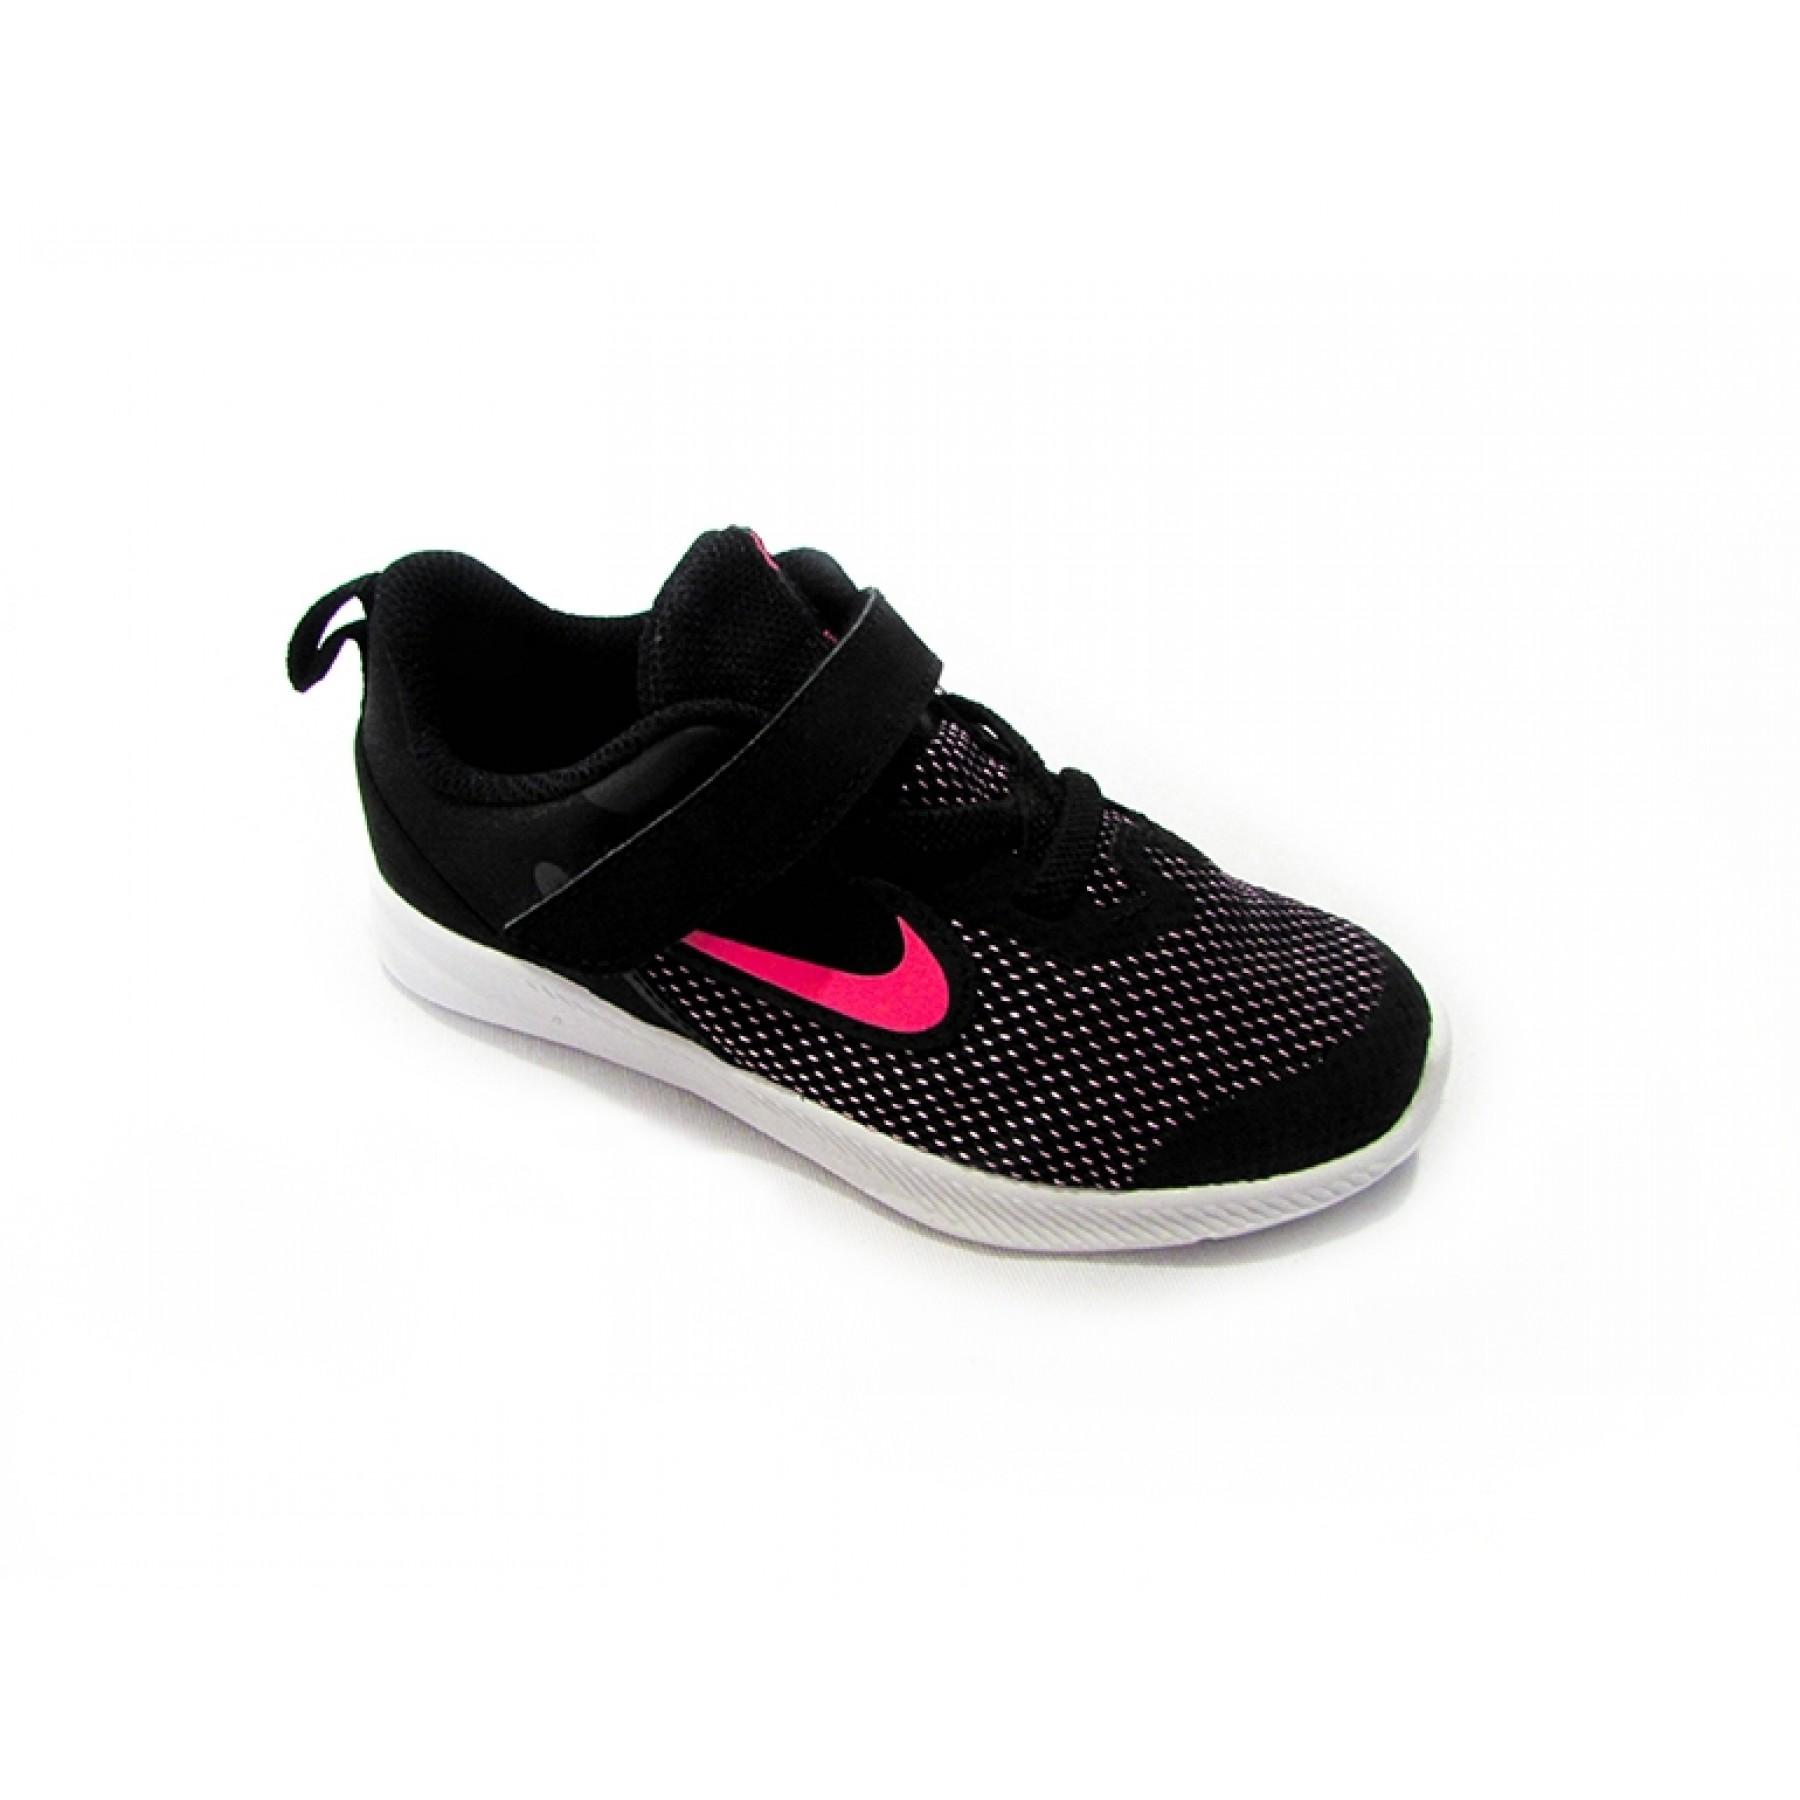 Tenis Nike Downshifter 9 Tdv